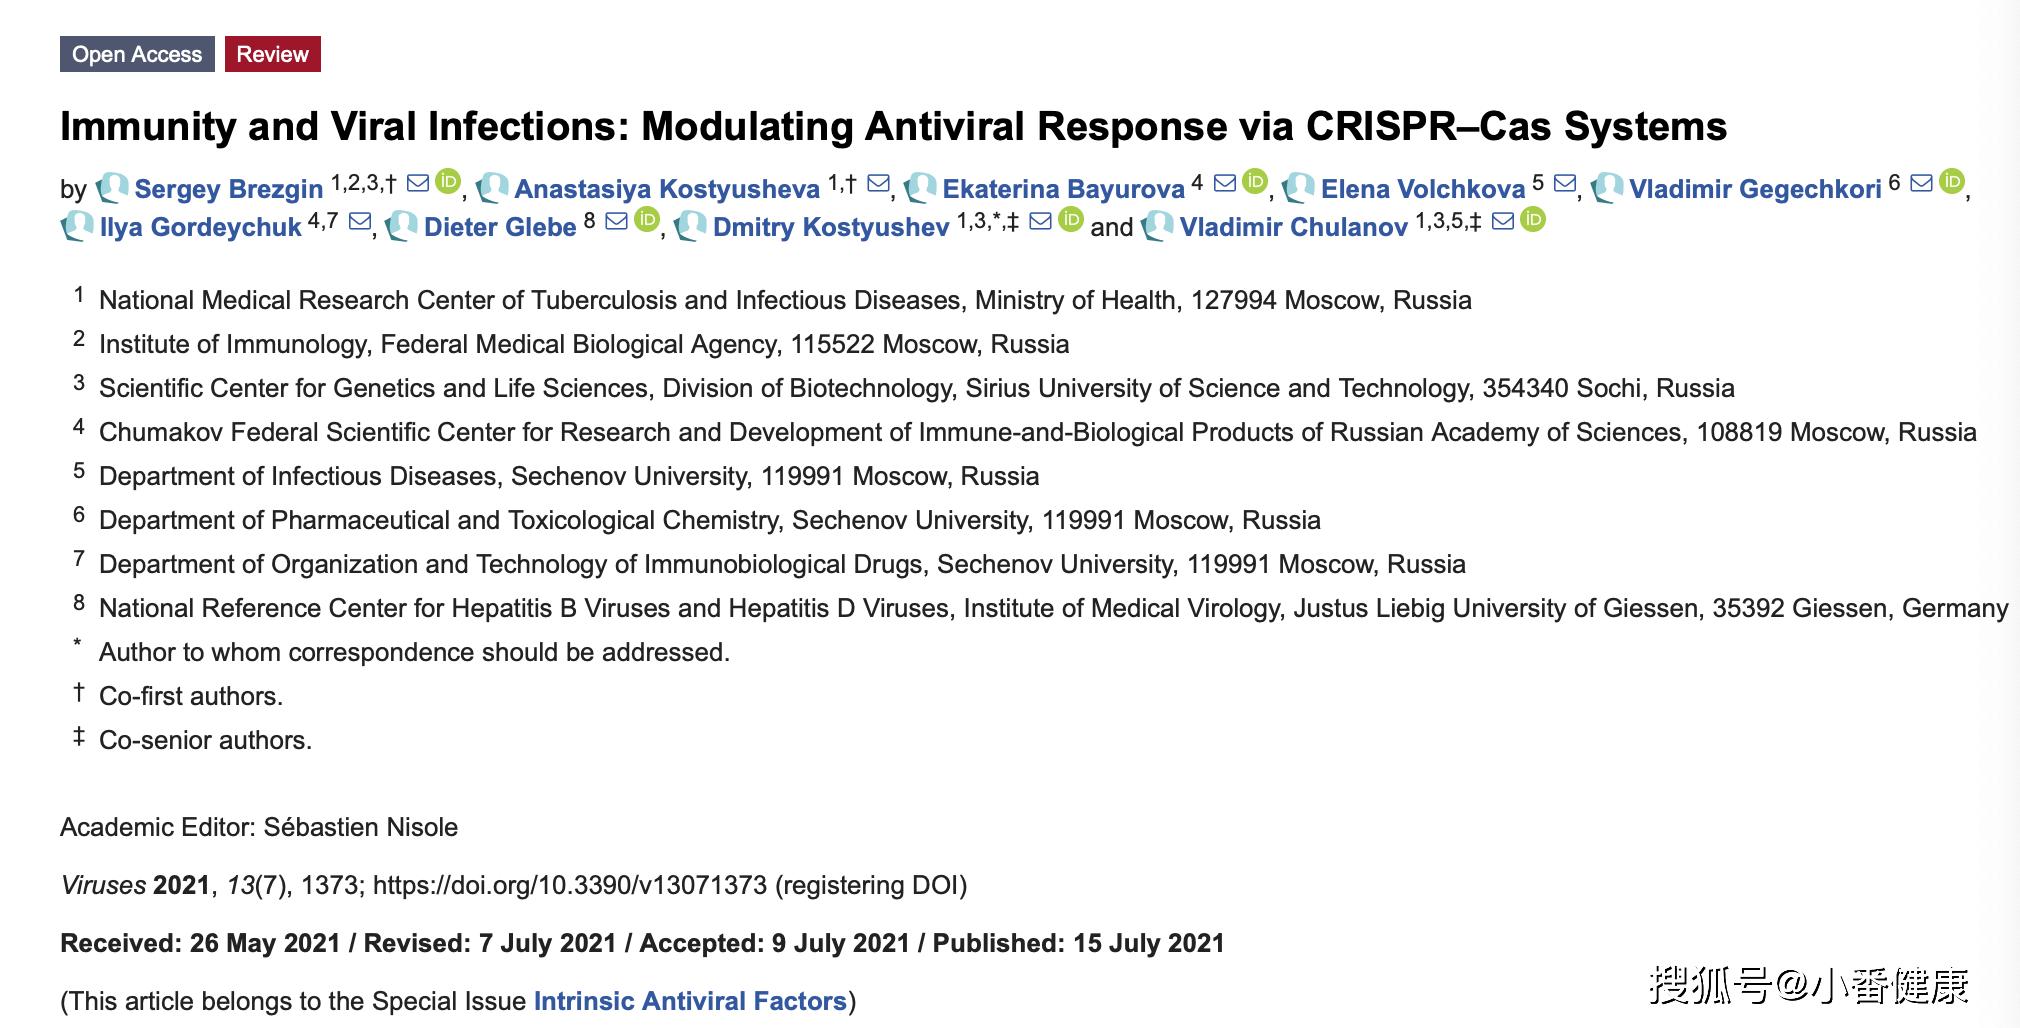 CRISPR-Cas应用前景 科学家介绍 其增强反应包括乙肝领域 健康 第4张